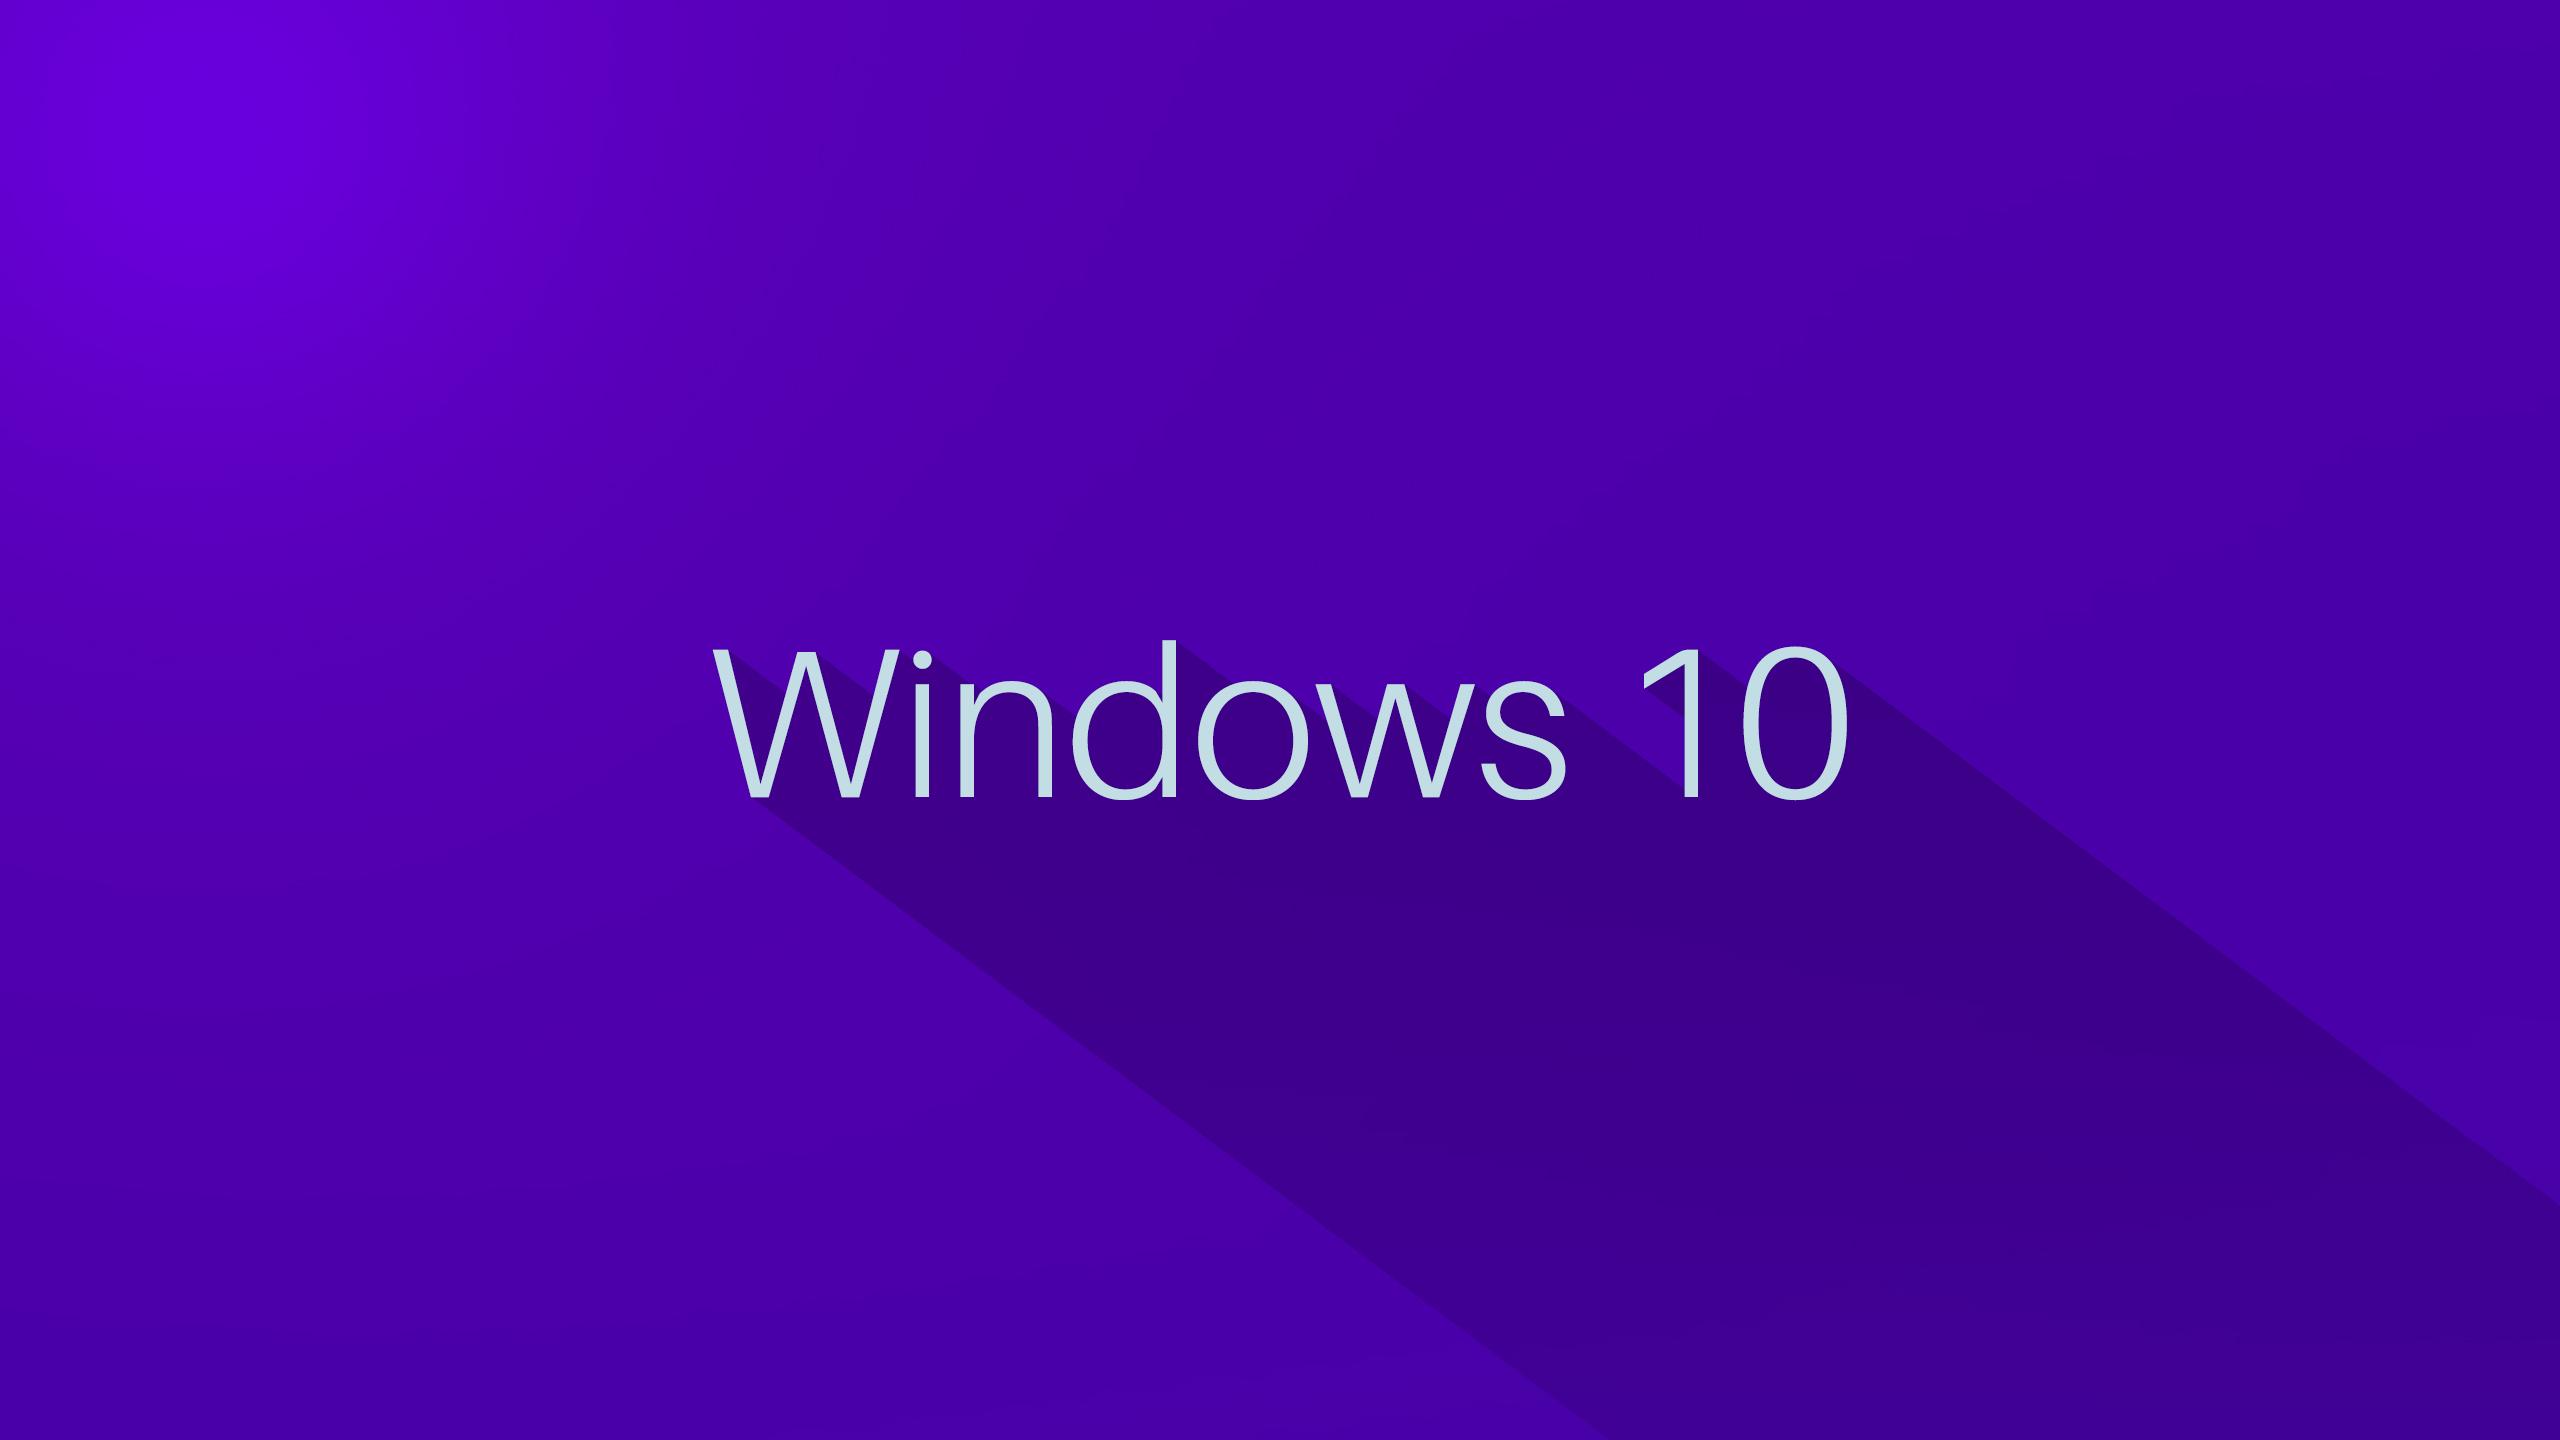 microsoft windows 10 desktop wallpapers